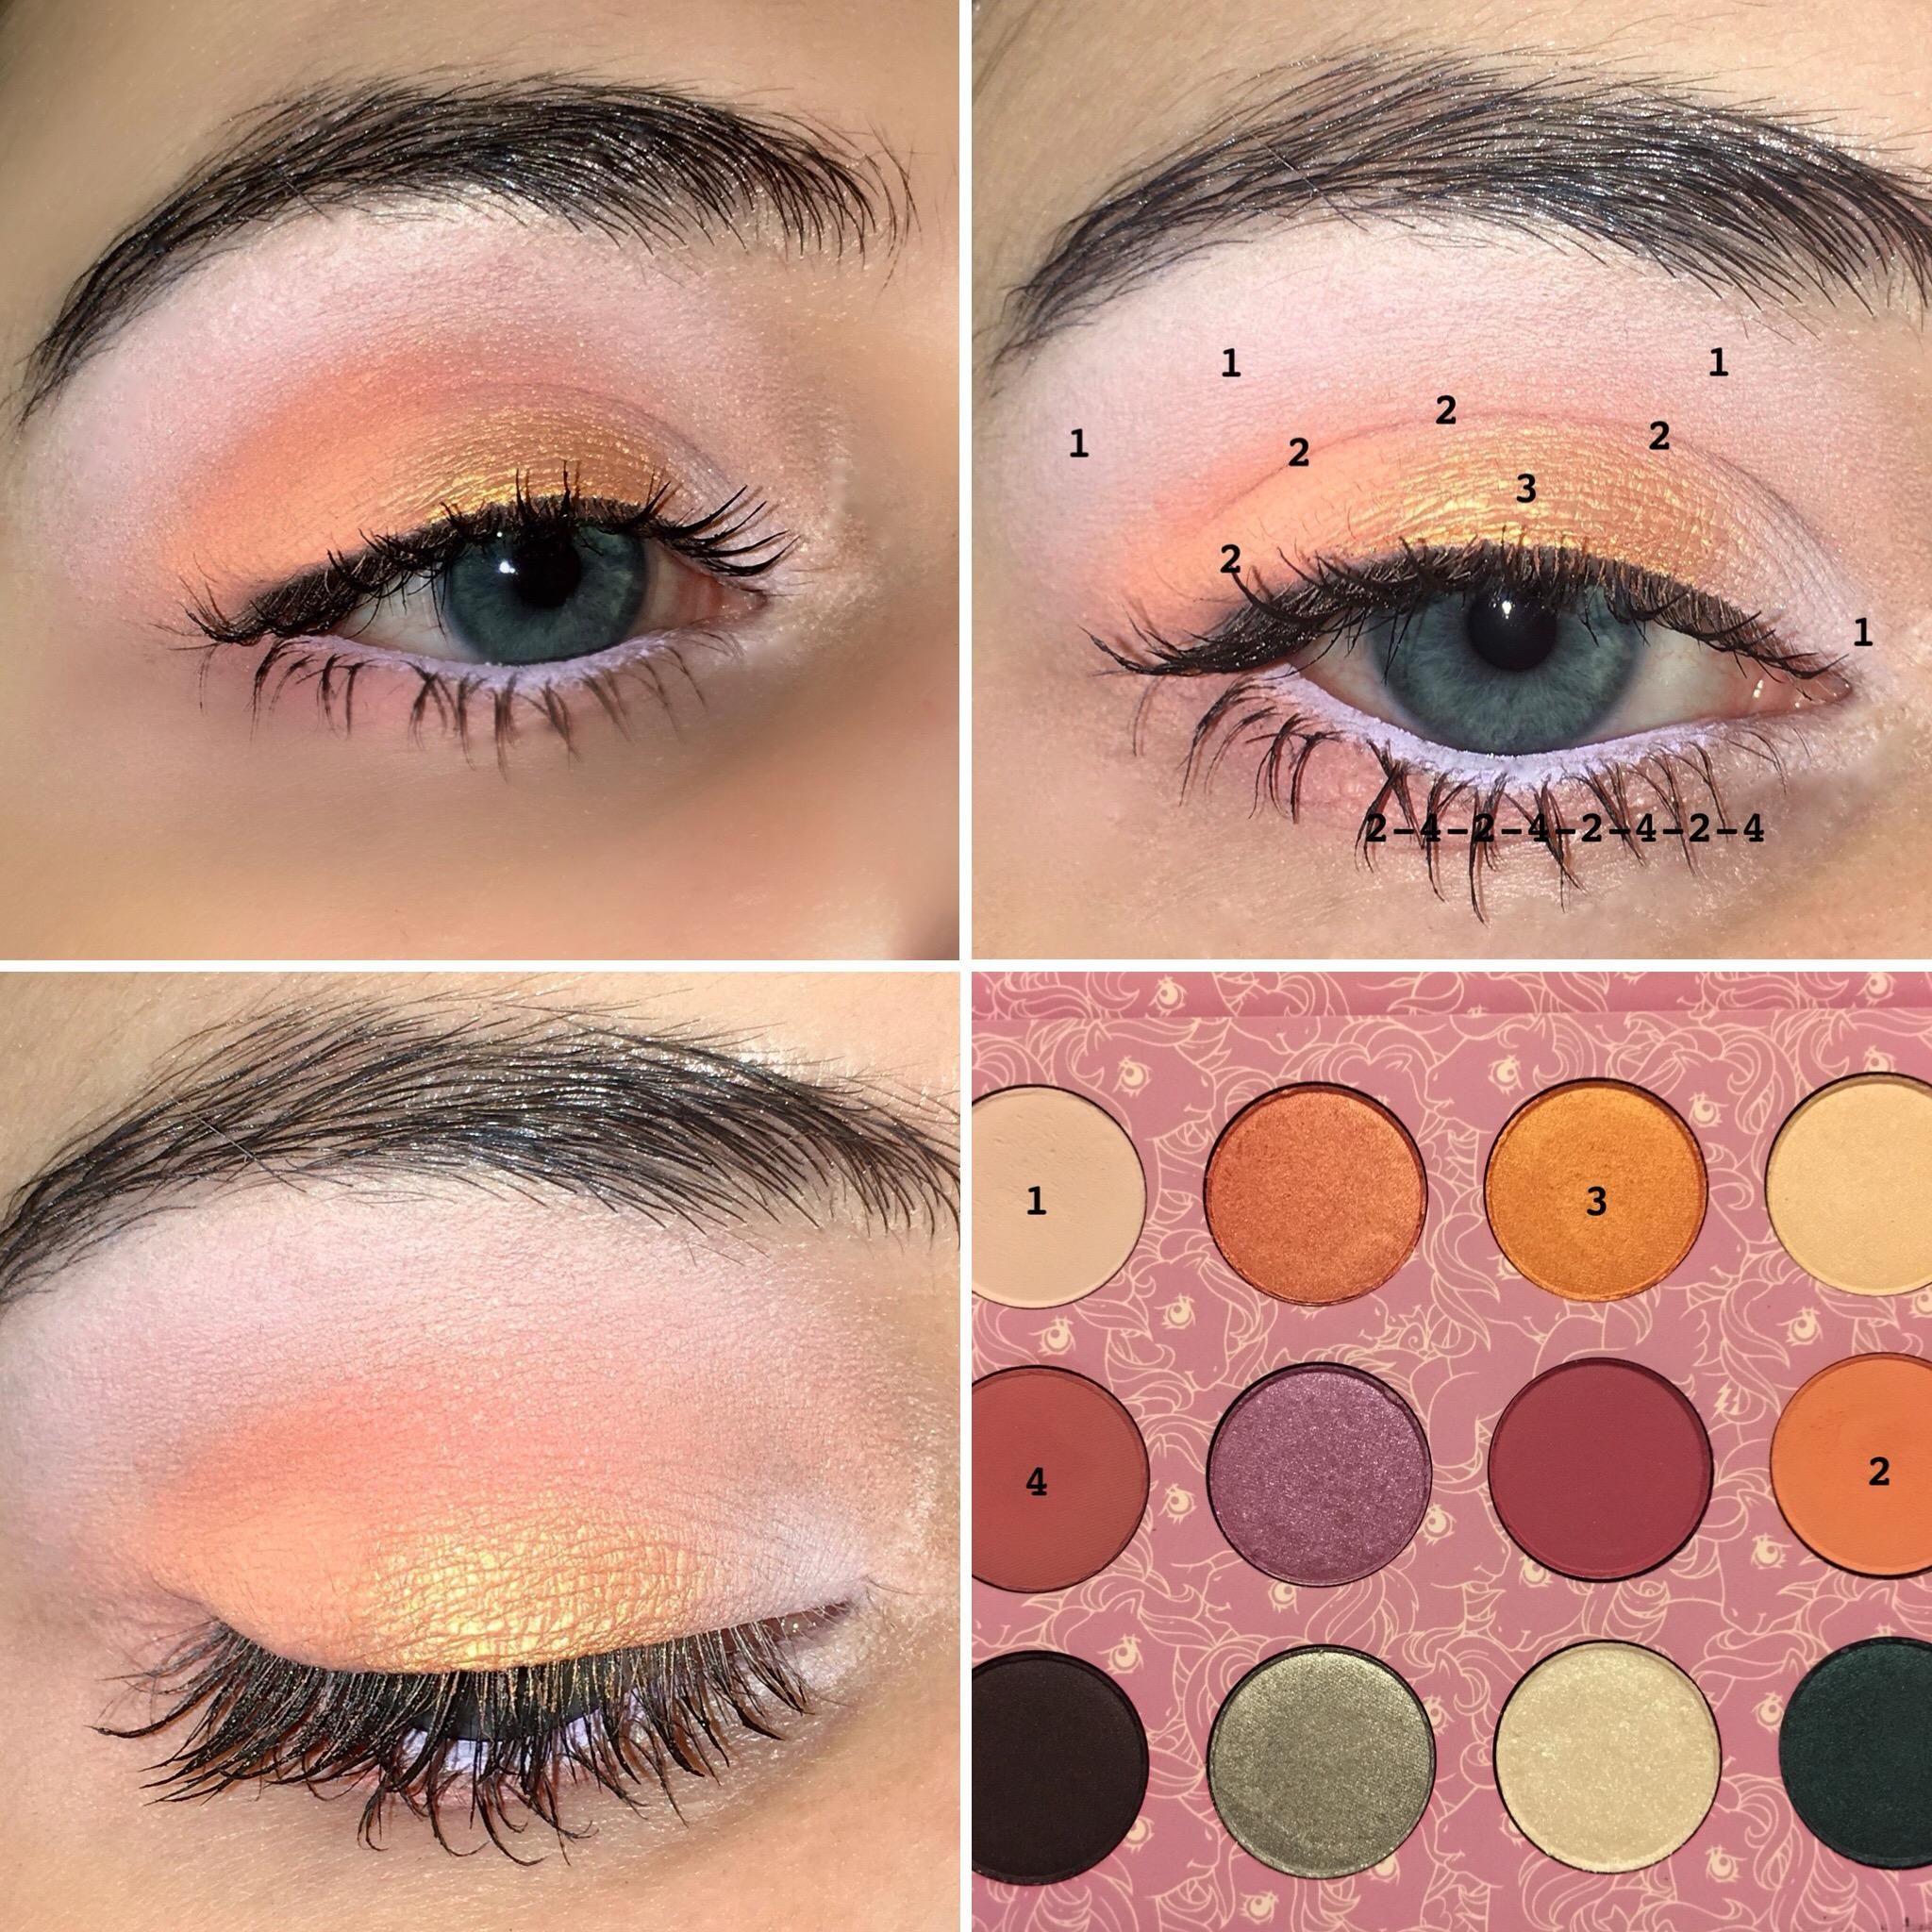 Colourpop My Little Pony palette look (CCW) Pony makeup